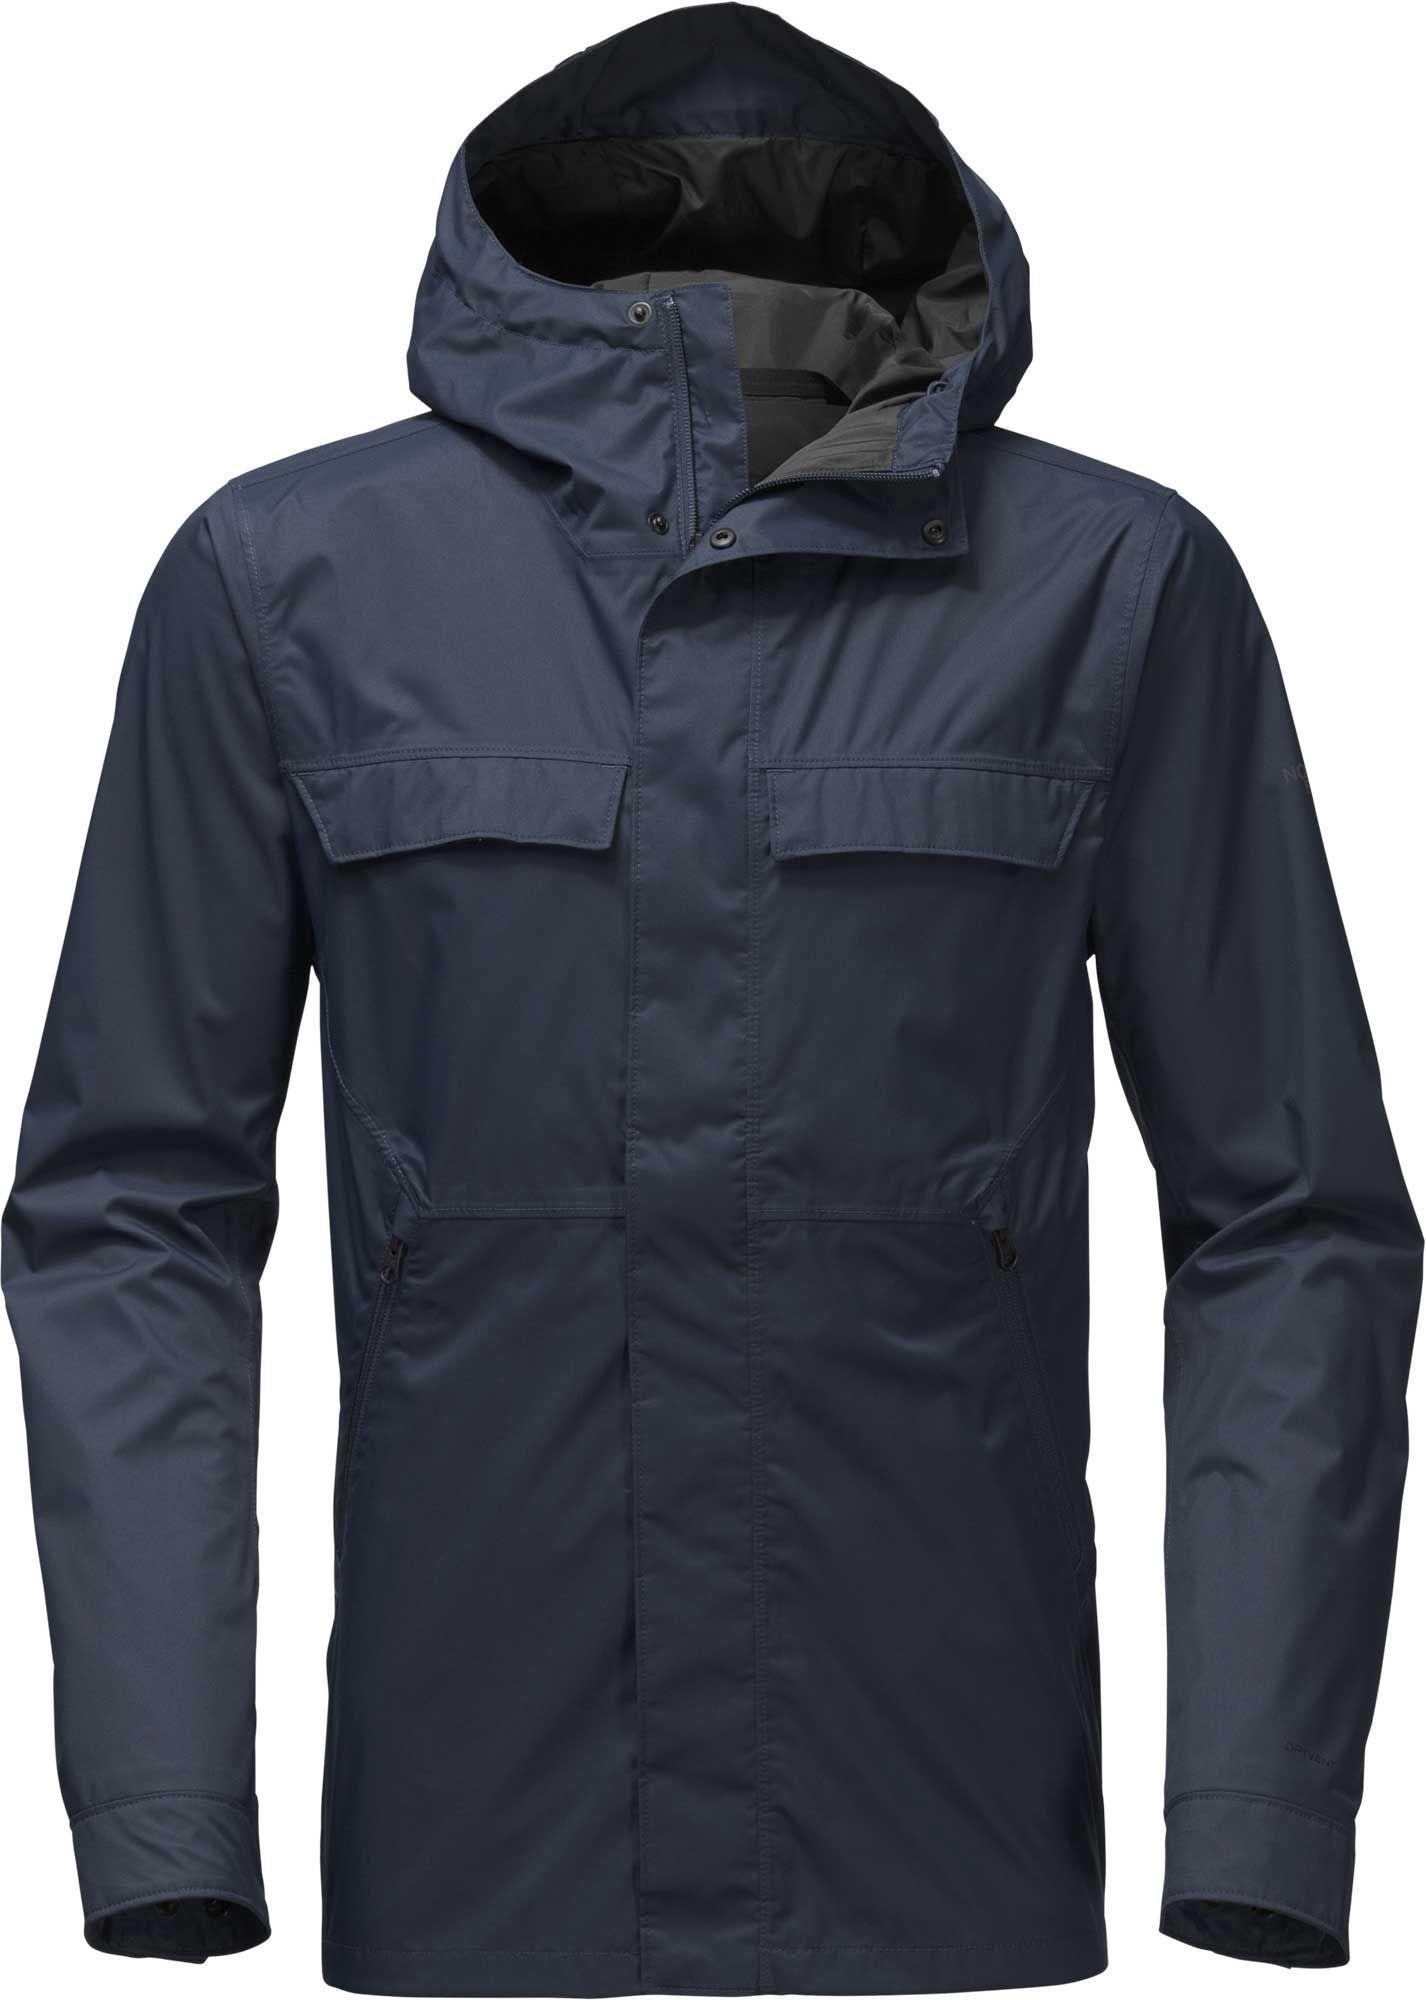 335e940244 The North Face Men s Jenison II Jacket